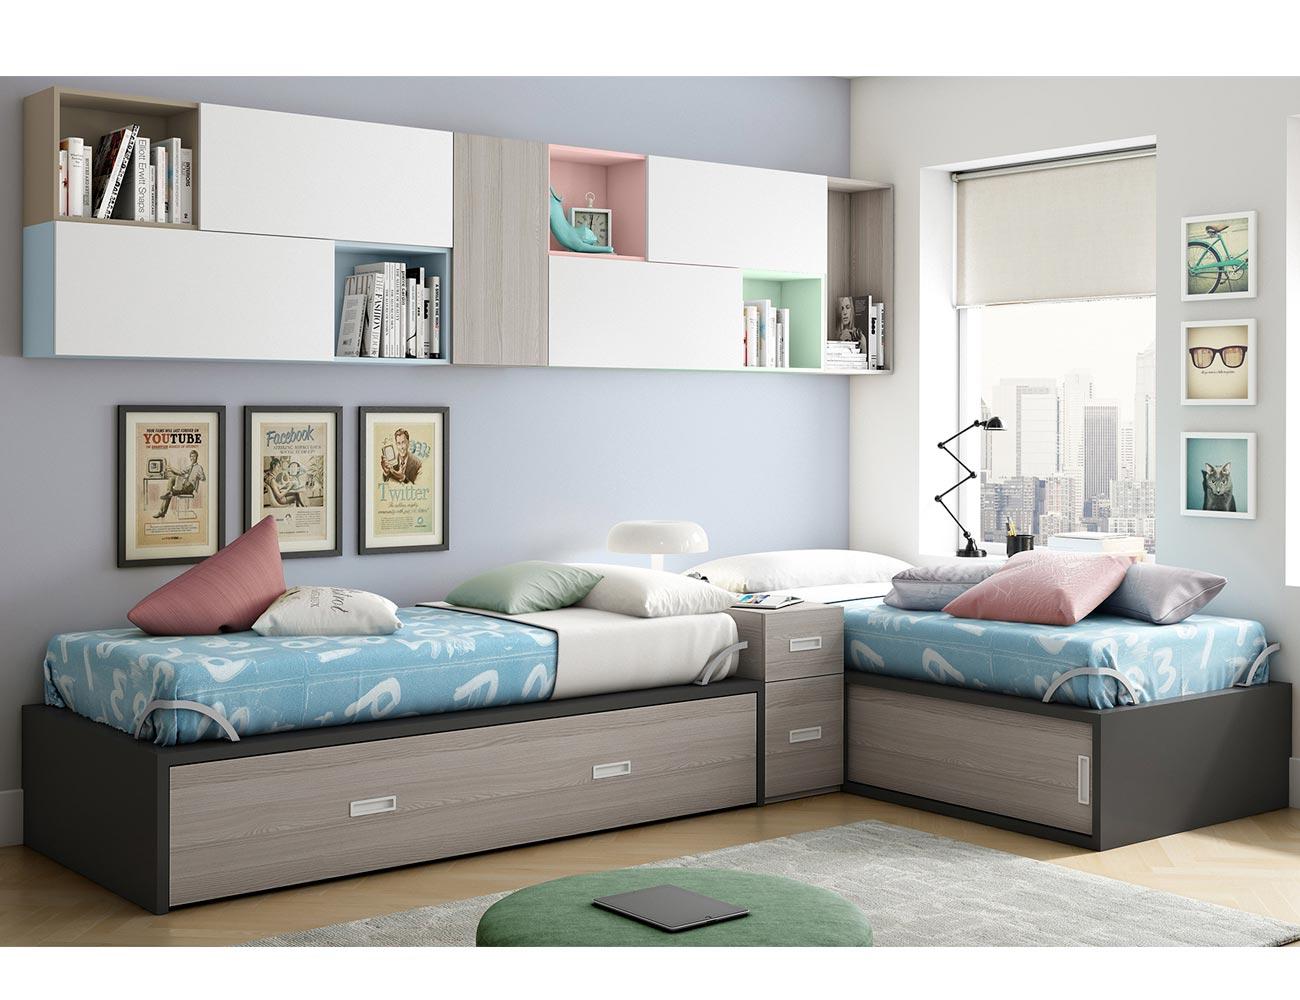 Dormitorio juvenil con dos cama nido dispuestas en l for Dormitorios juveniles dos camas en l